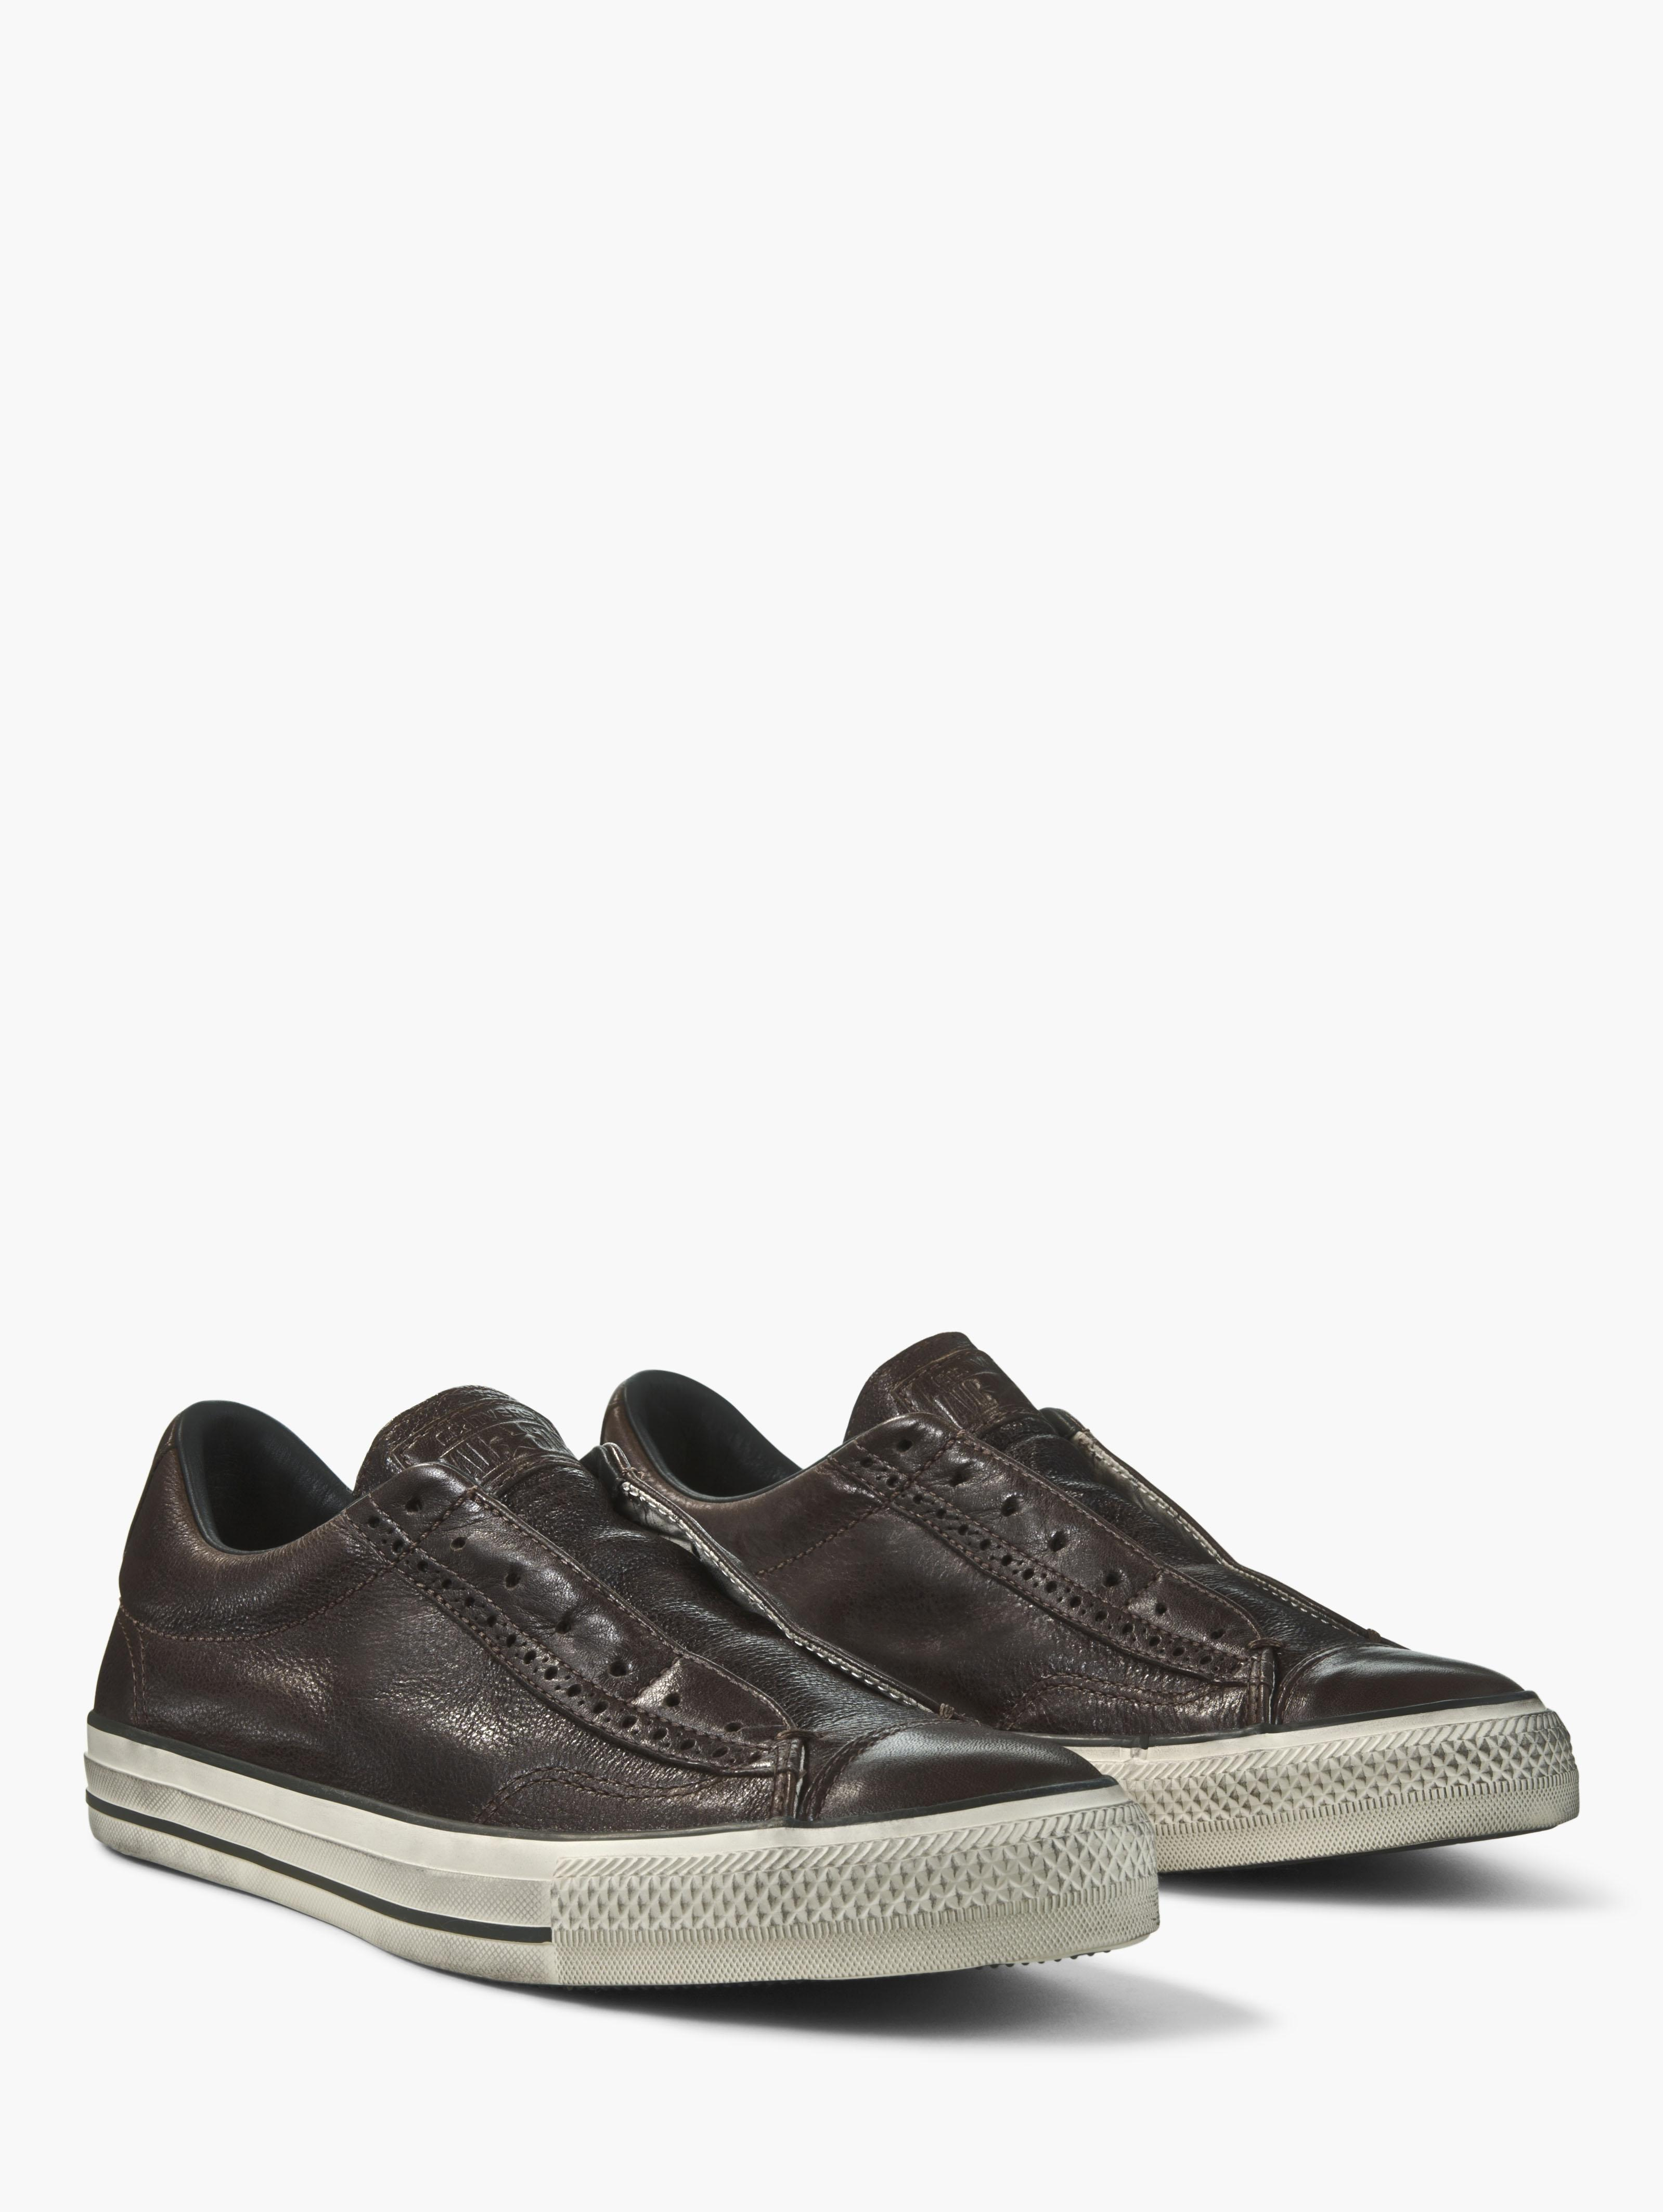 converse vintage. chuck taylor vintage leather slip on converse